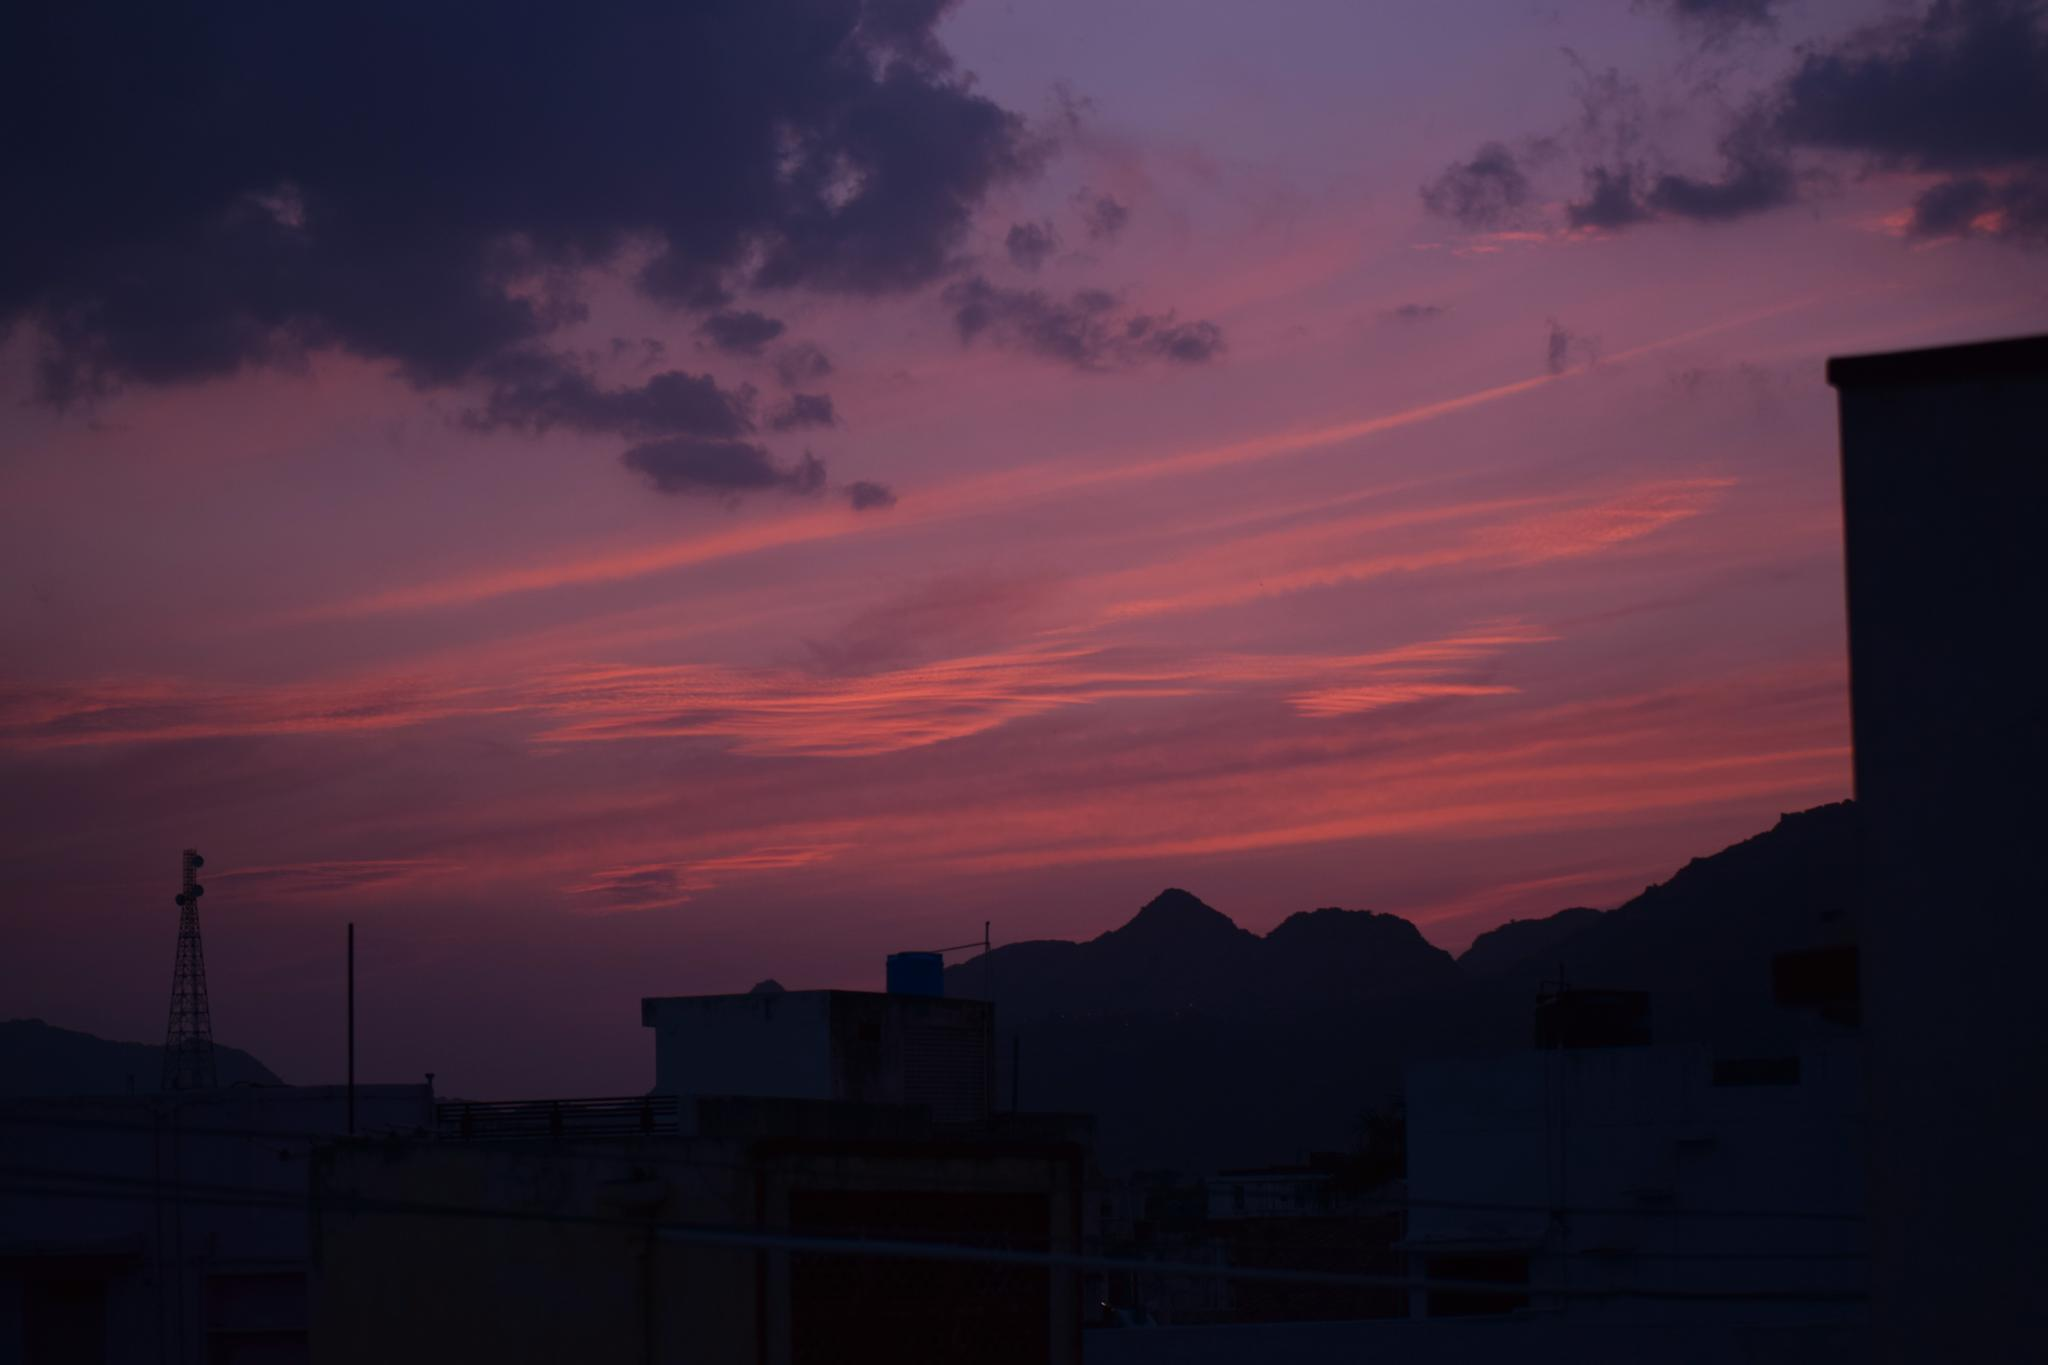 Late Evening by Hitesh Lalwani